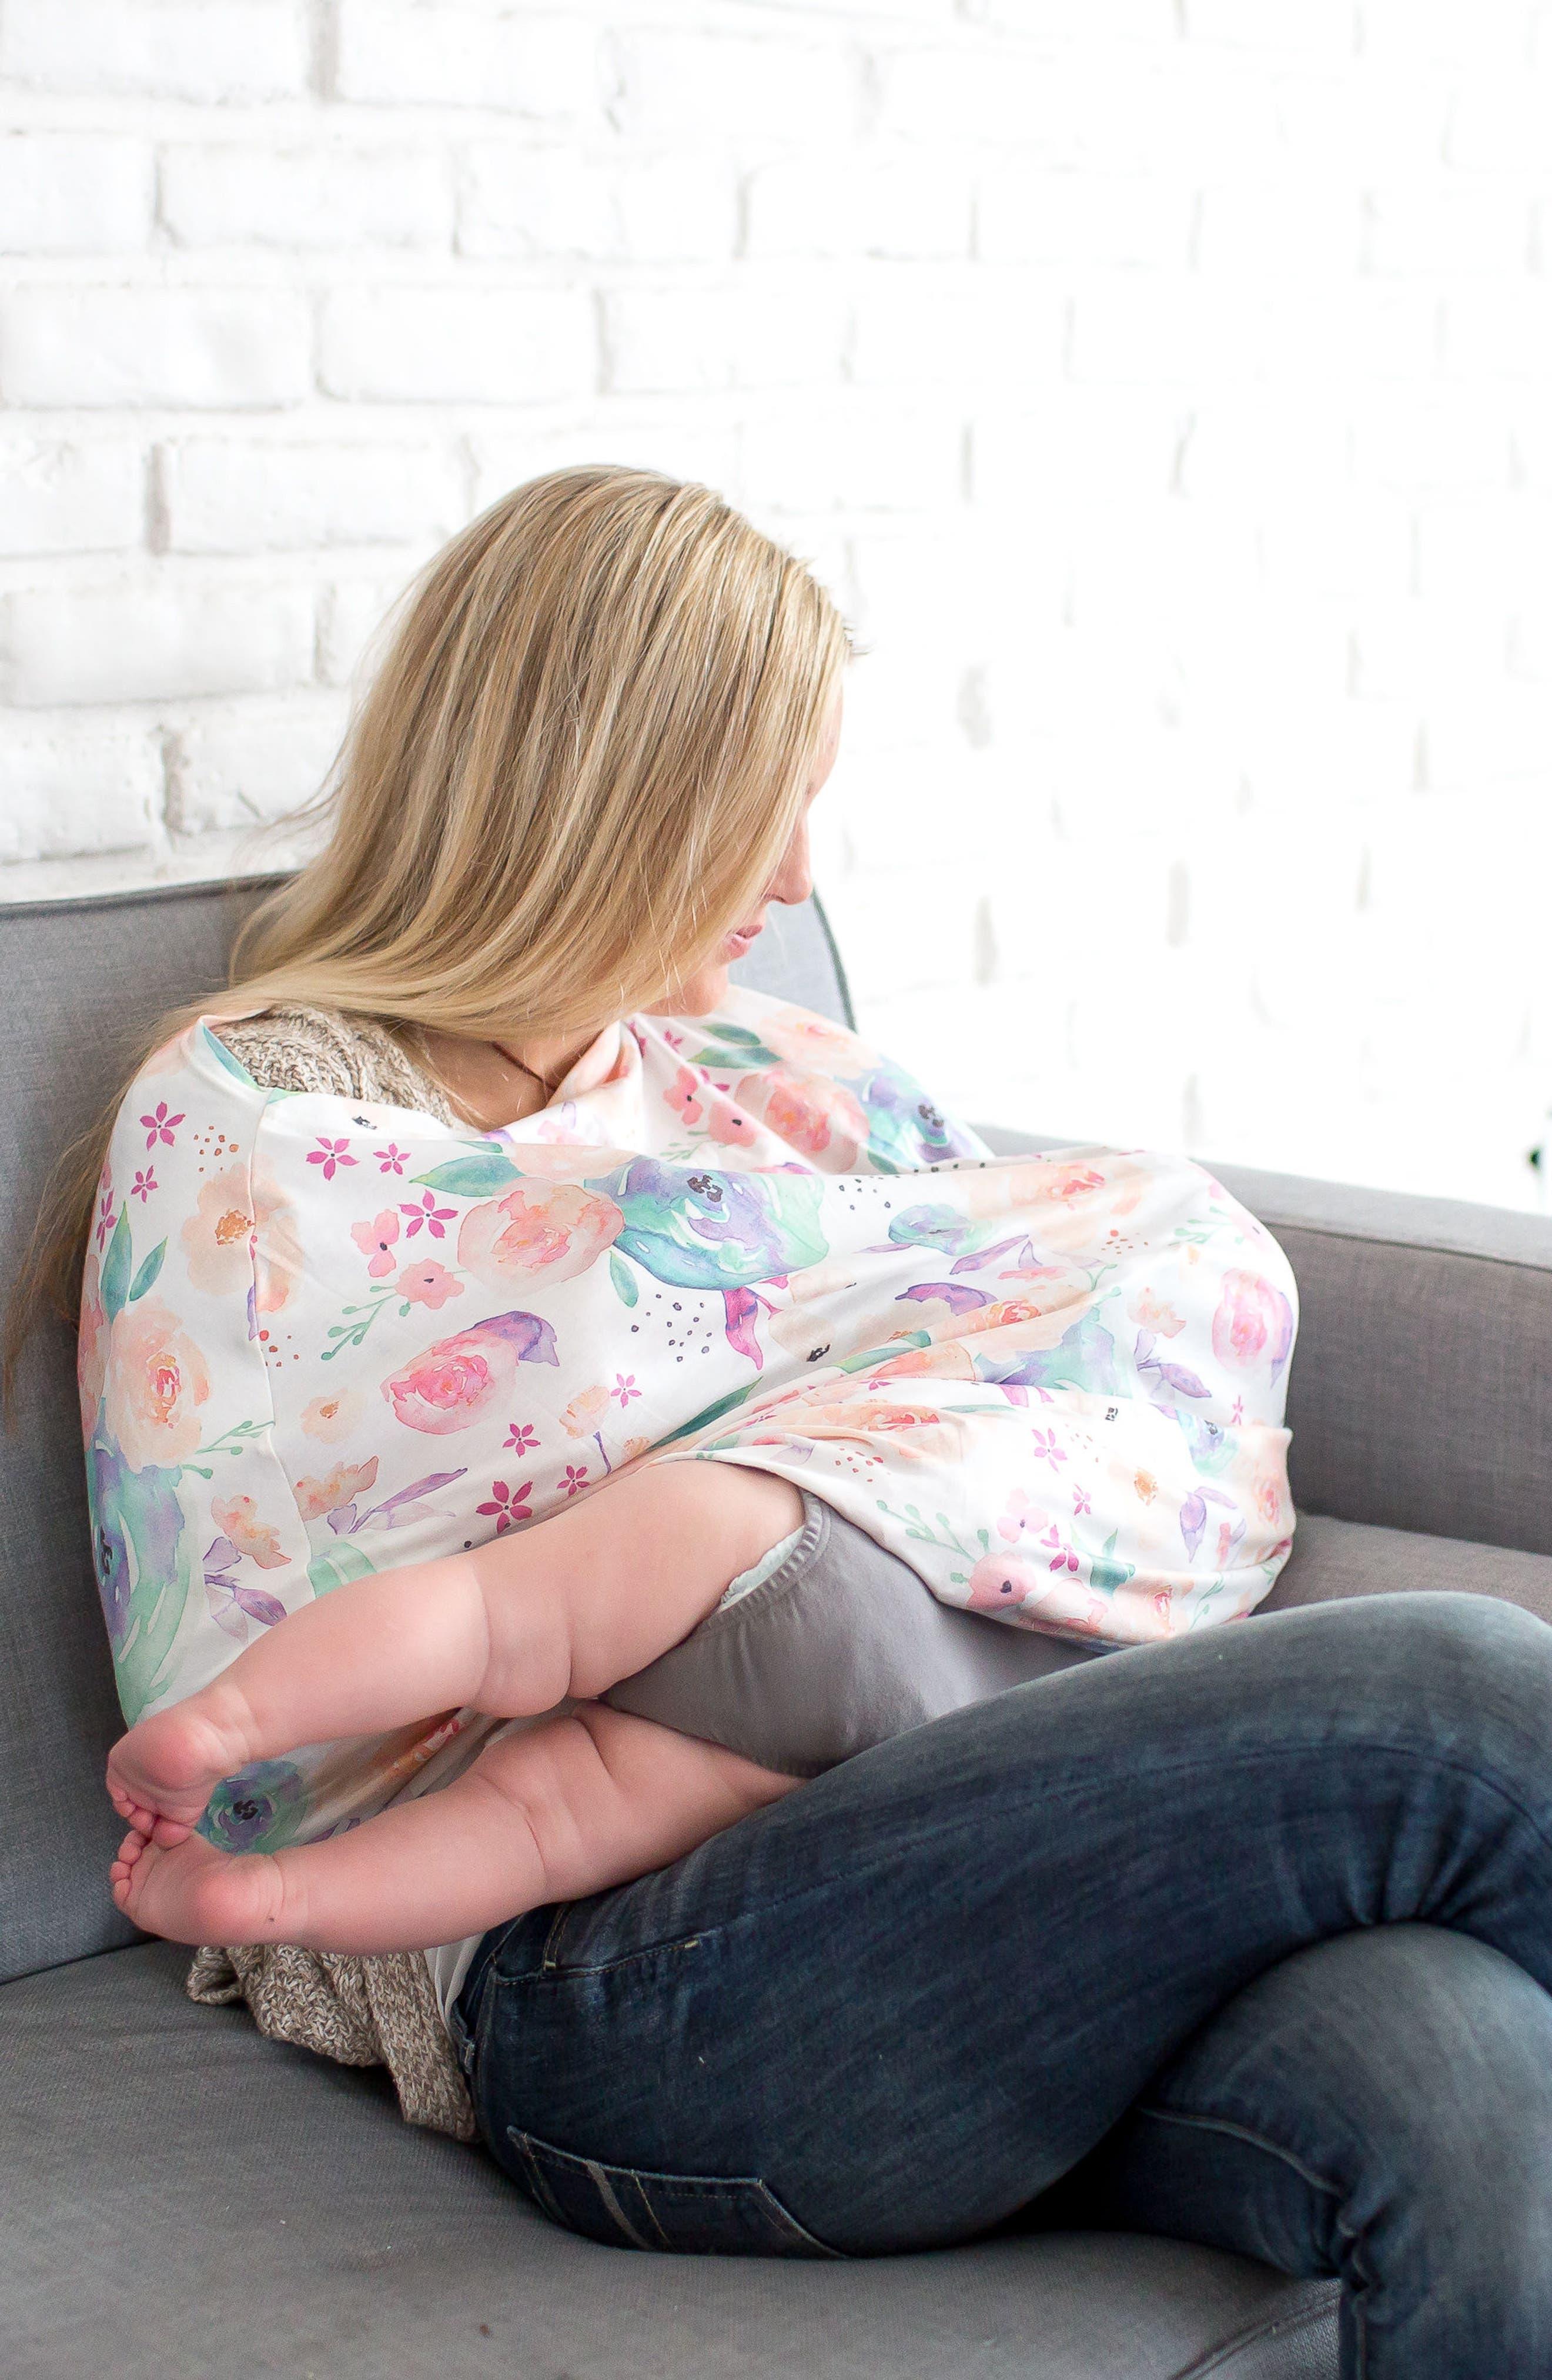 Bloom Multiuse Cover & Swaddle Blanket Gift Set,                             Alternate thumbnail 11, color,                             Bloom